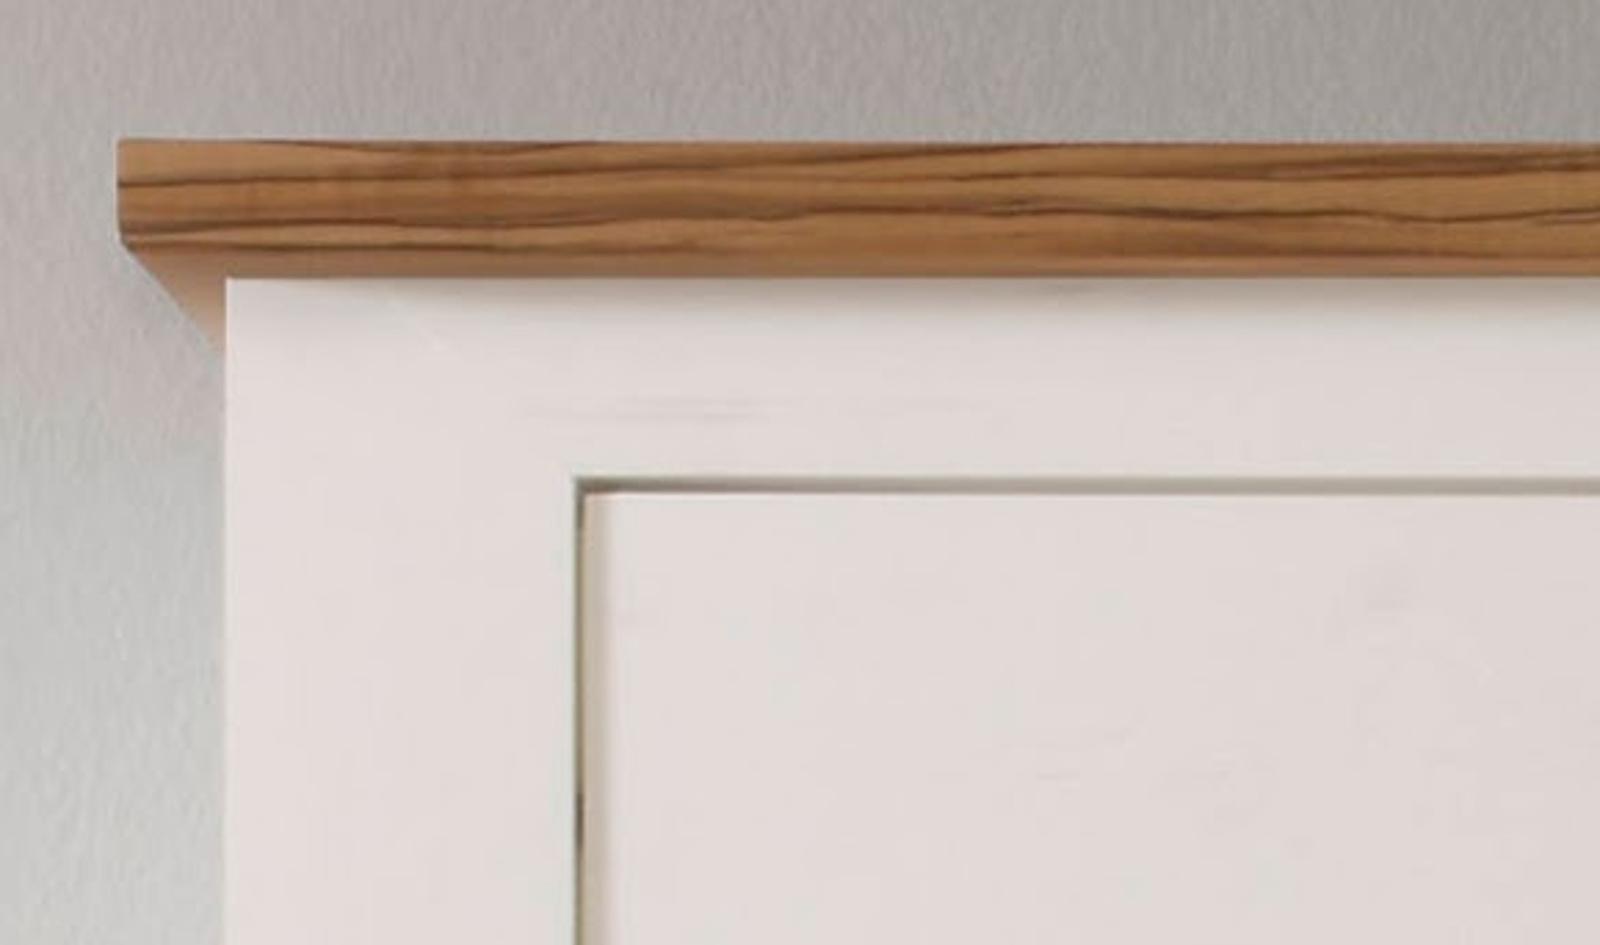 highboard anderson pinie wei nussbaum. Black Bedroom Furniture Sets. Home Design Ideas